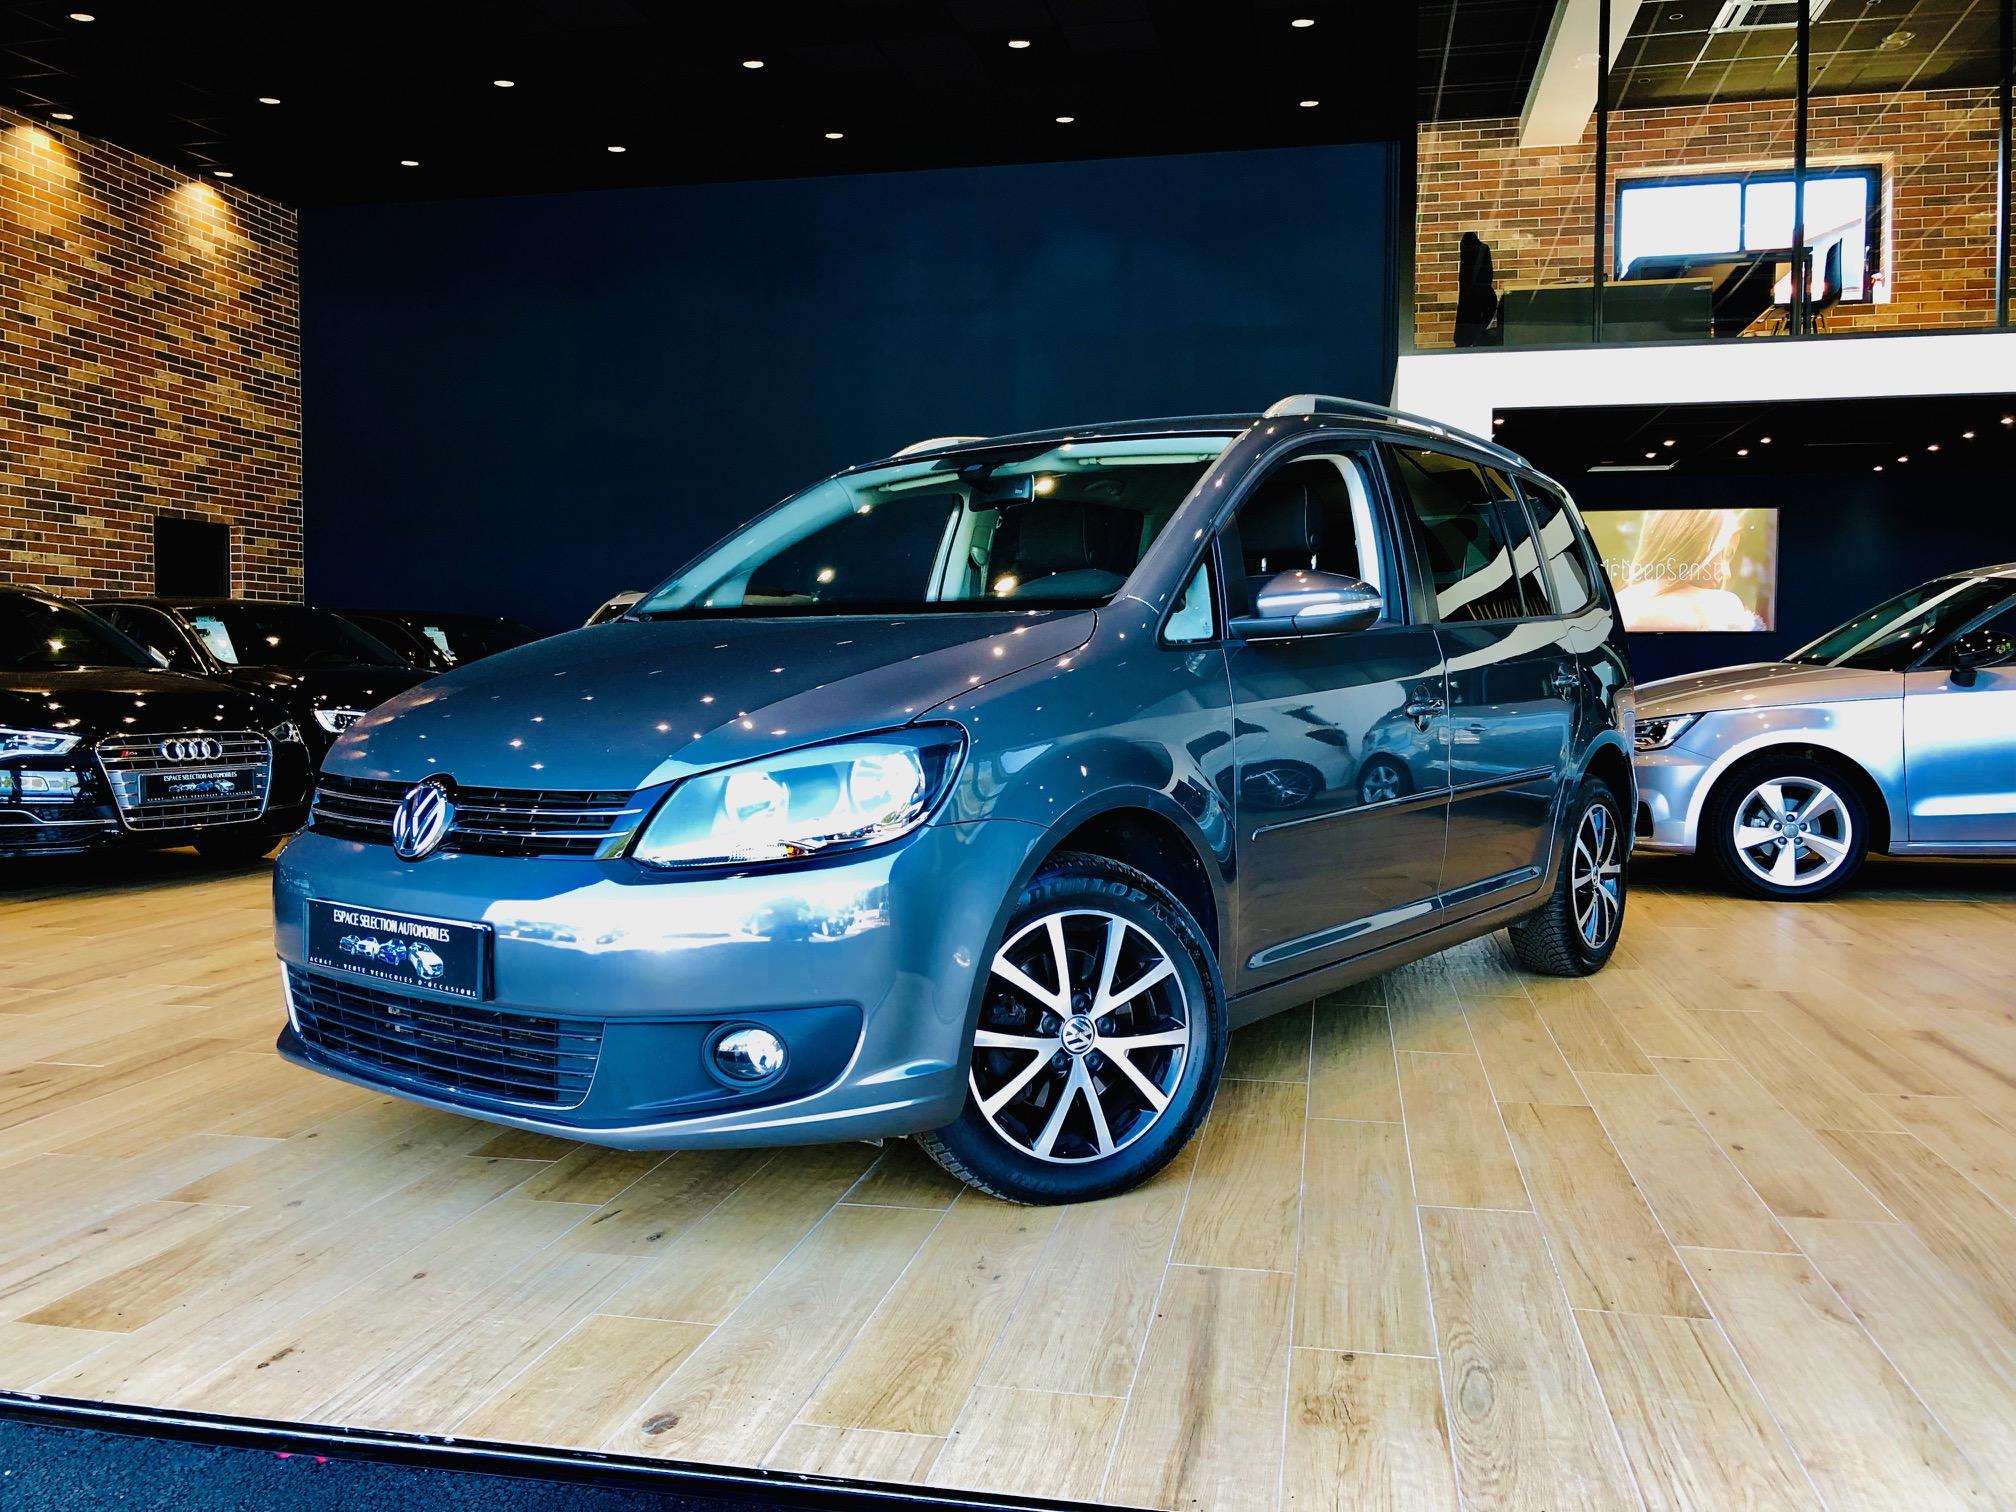 Occasion Volkswagen Touran 1.9 tdi 105cv Face Avant Droite